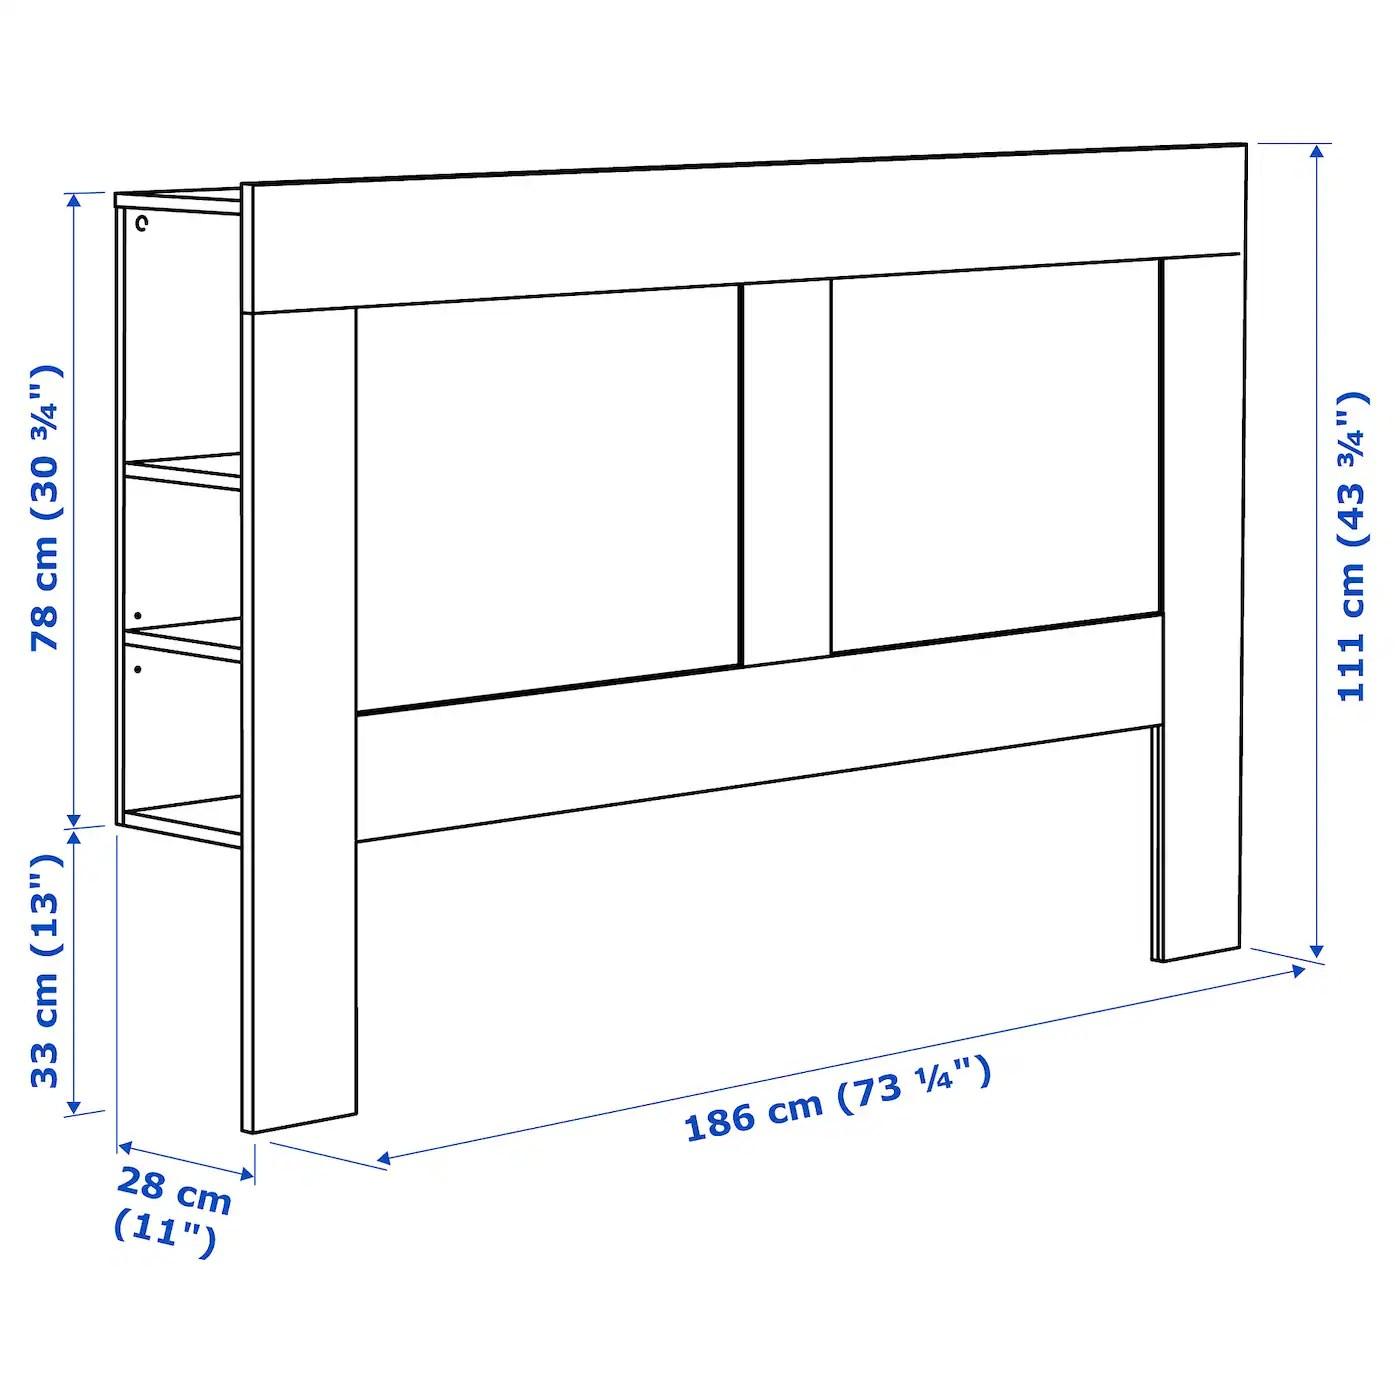 Brimnes Headboard With Storage Compartment White 180 Cm Ikea